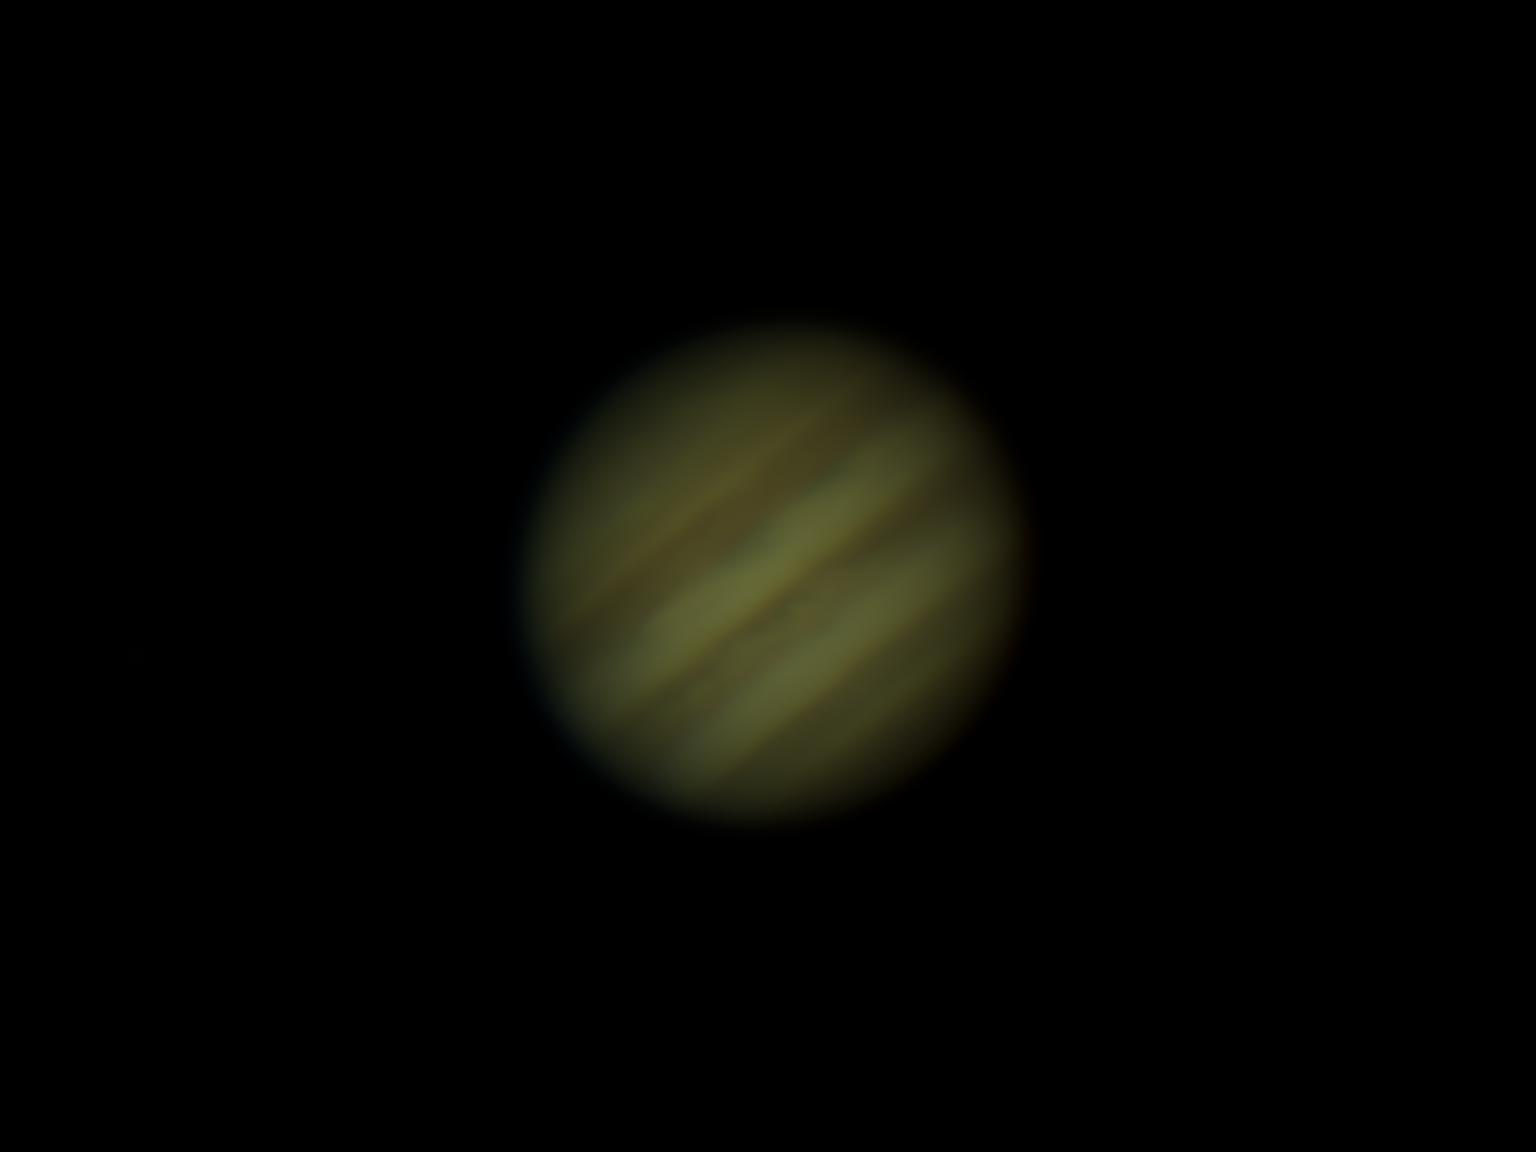 New Jupiter - Callisto 24-4-17 à 00h01'15'' DRIZZLE 1.5 X 170426104214248406